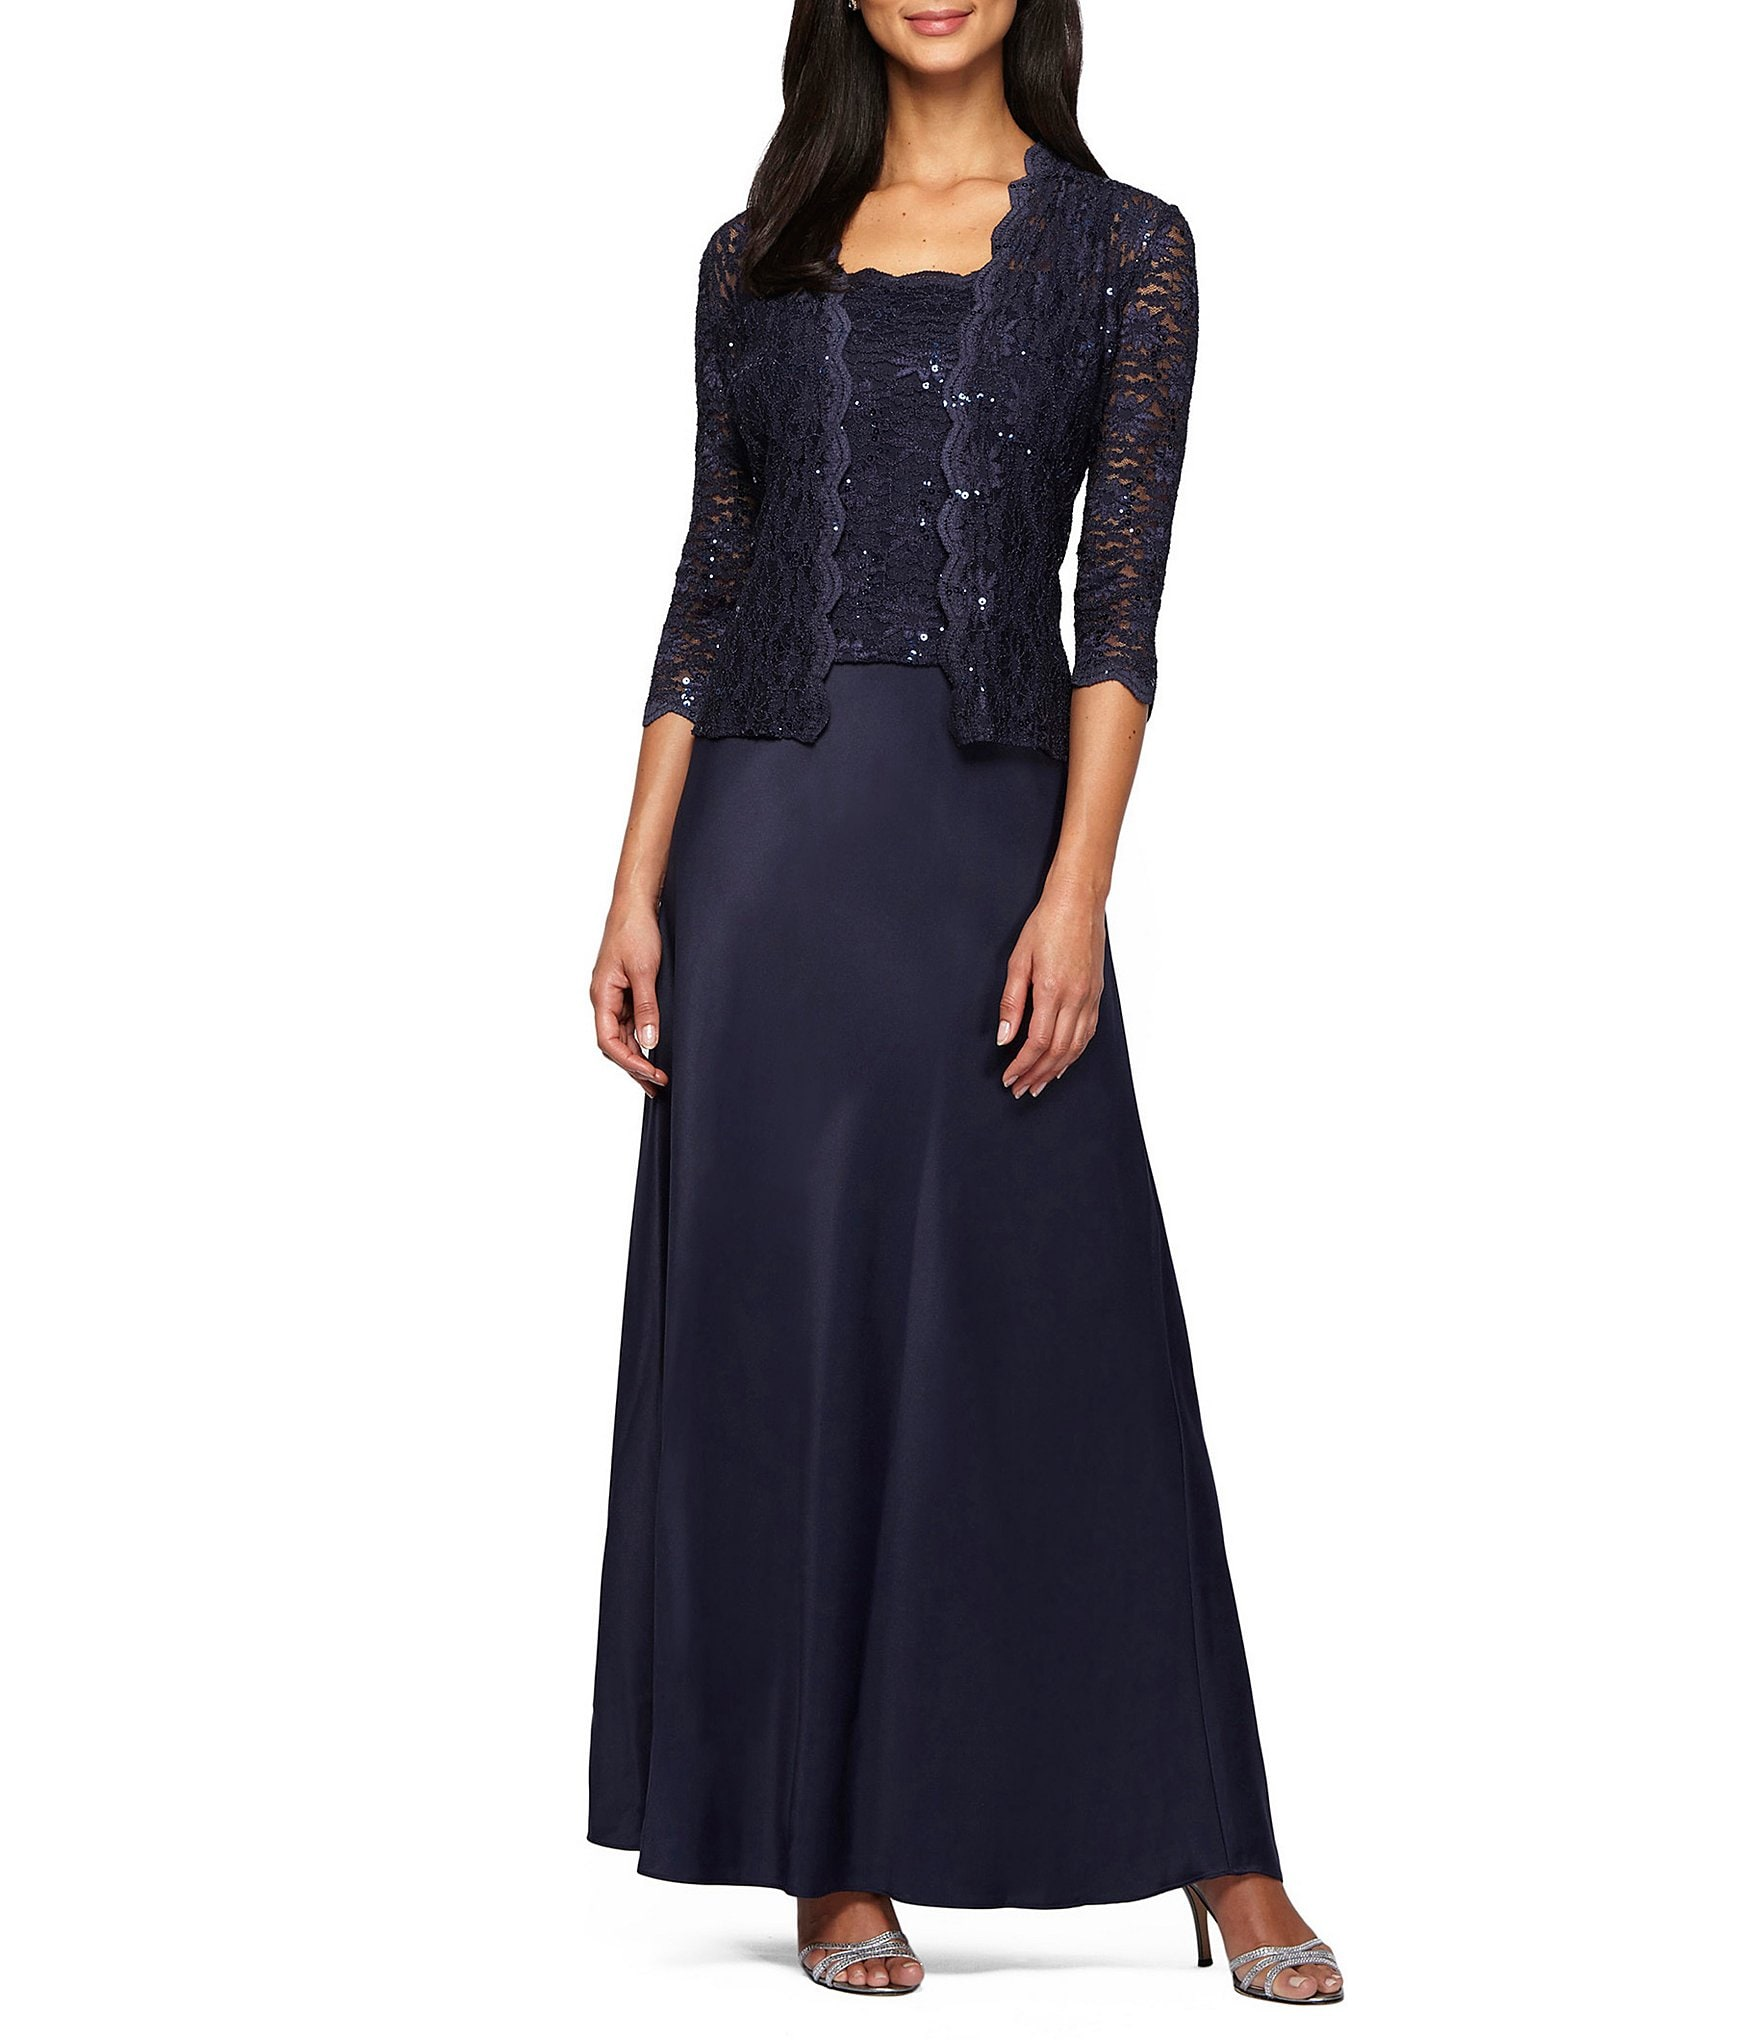 Dressing Gowns For Women: Alex Evenings Sequin A-Line Jacket Dress